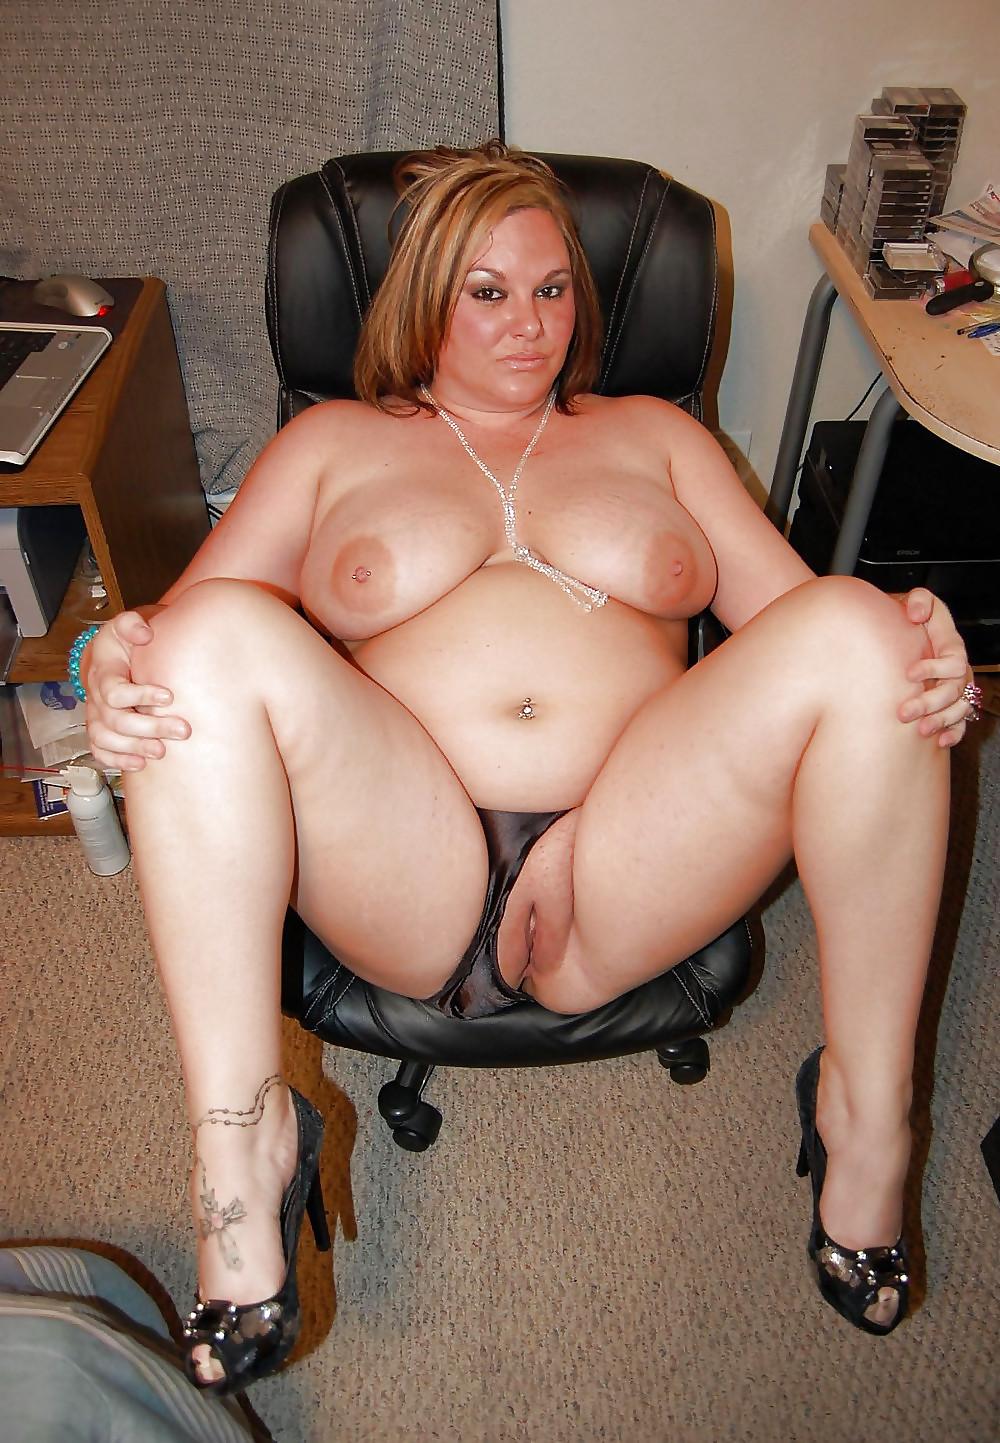 Xxx matures in panties spreading sex photo